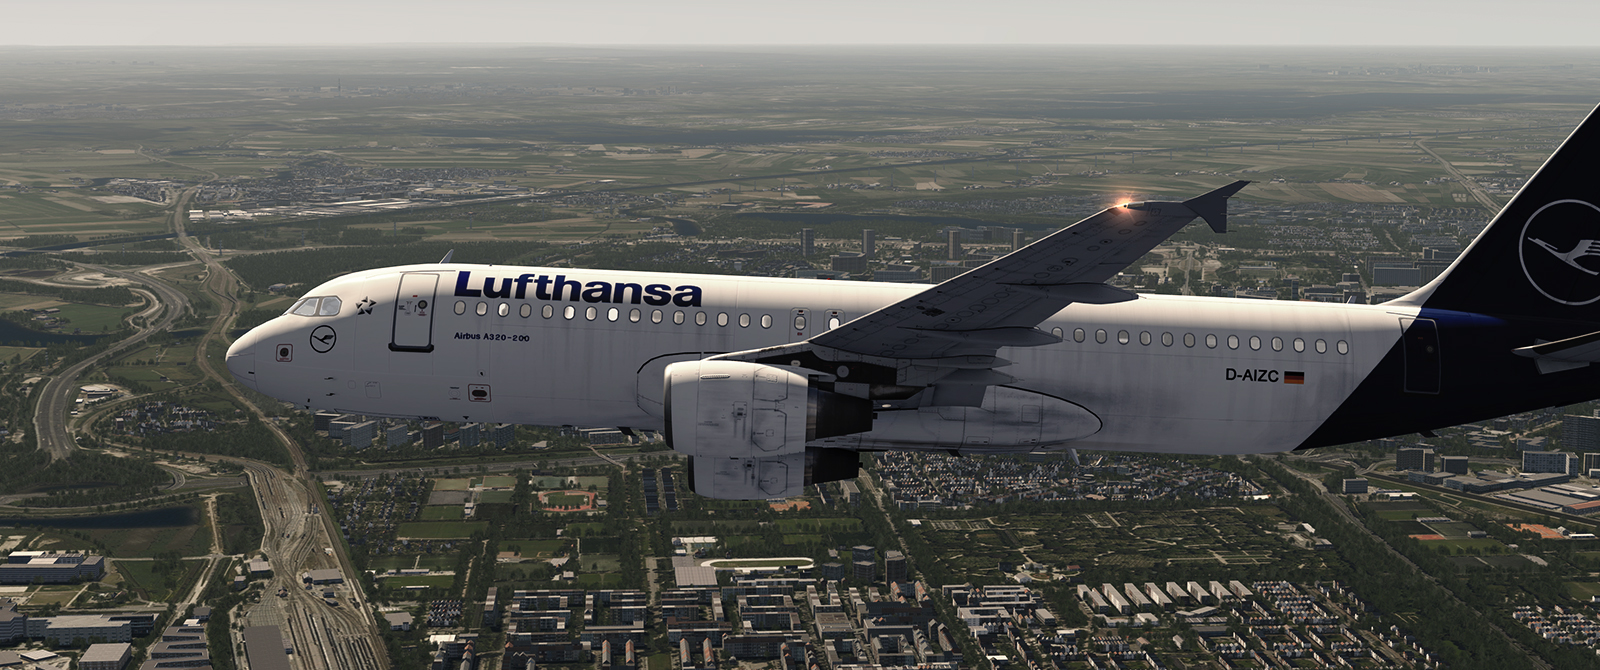 aerofly_fs_2_screenshot_17_20200201-2329